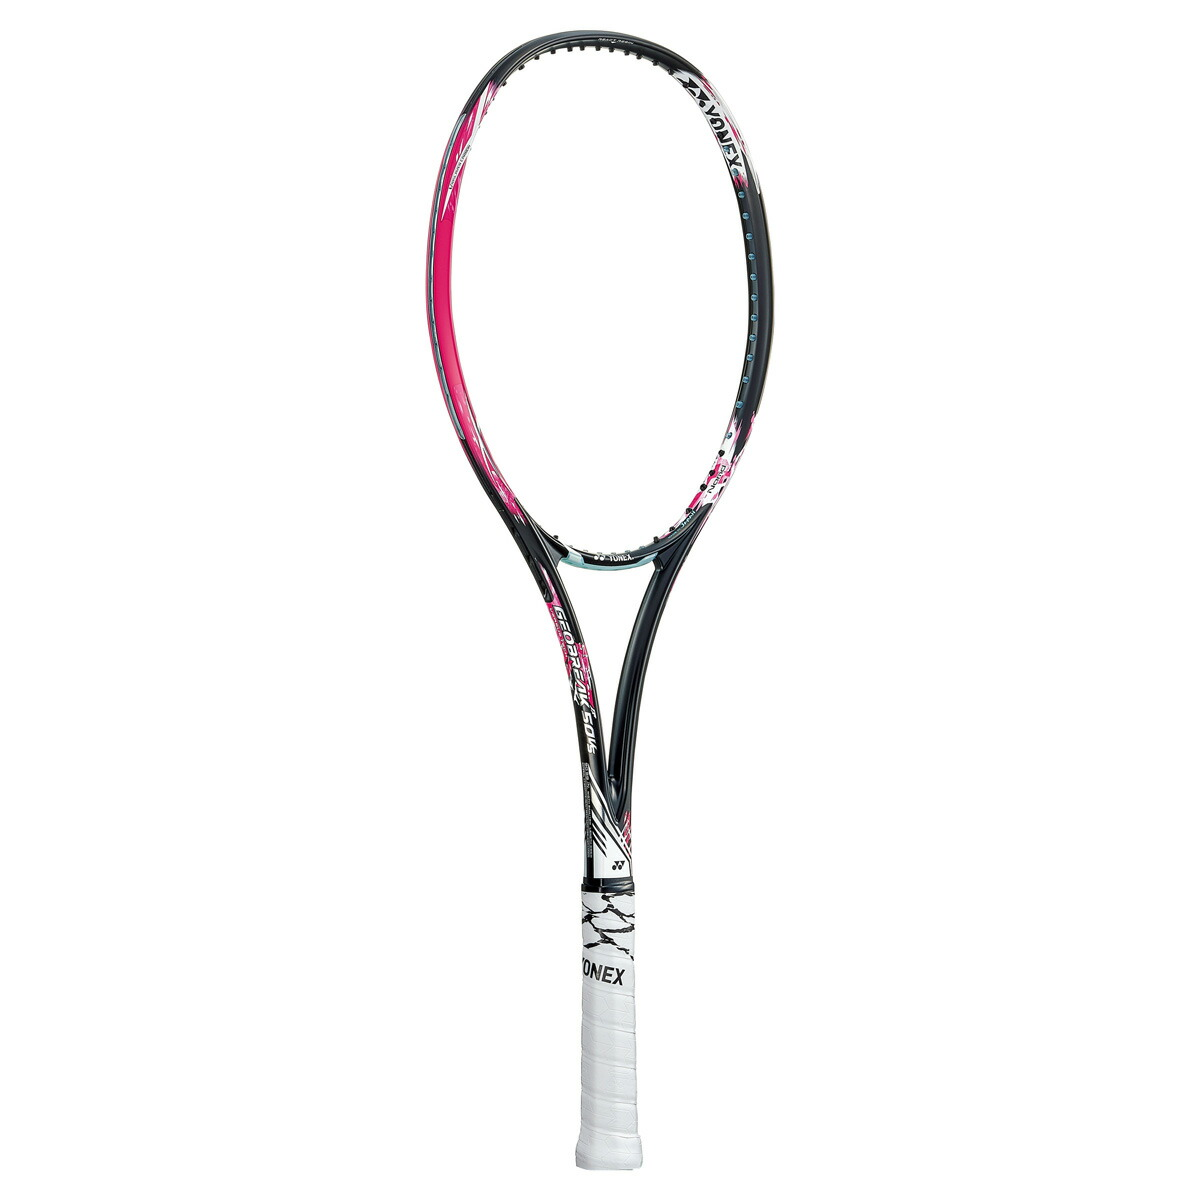 <title>送料無料 ガット張り無料 ヨネックス YONEX 軟式テニス 購買 ソフトテニスラケット ジオブレイク 50VERSUS GEOBREAK VS バーサス GEO50VS-604</title>